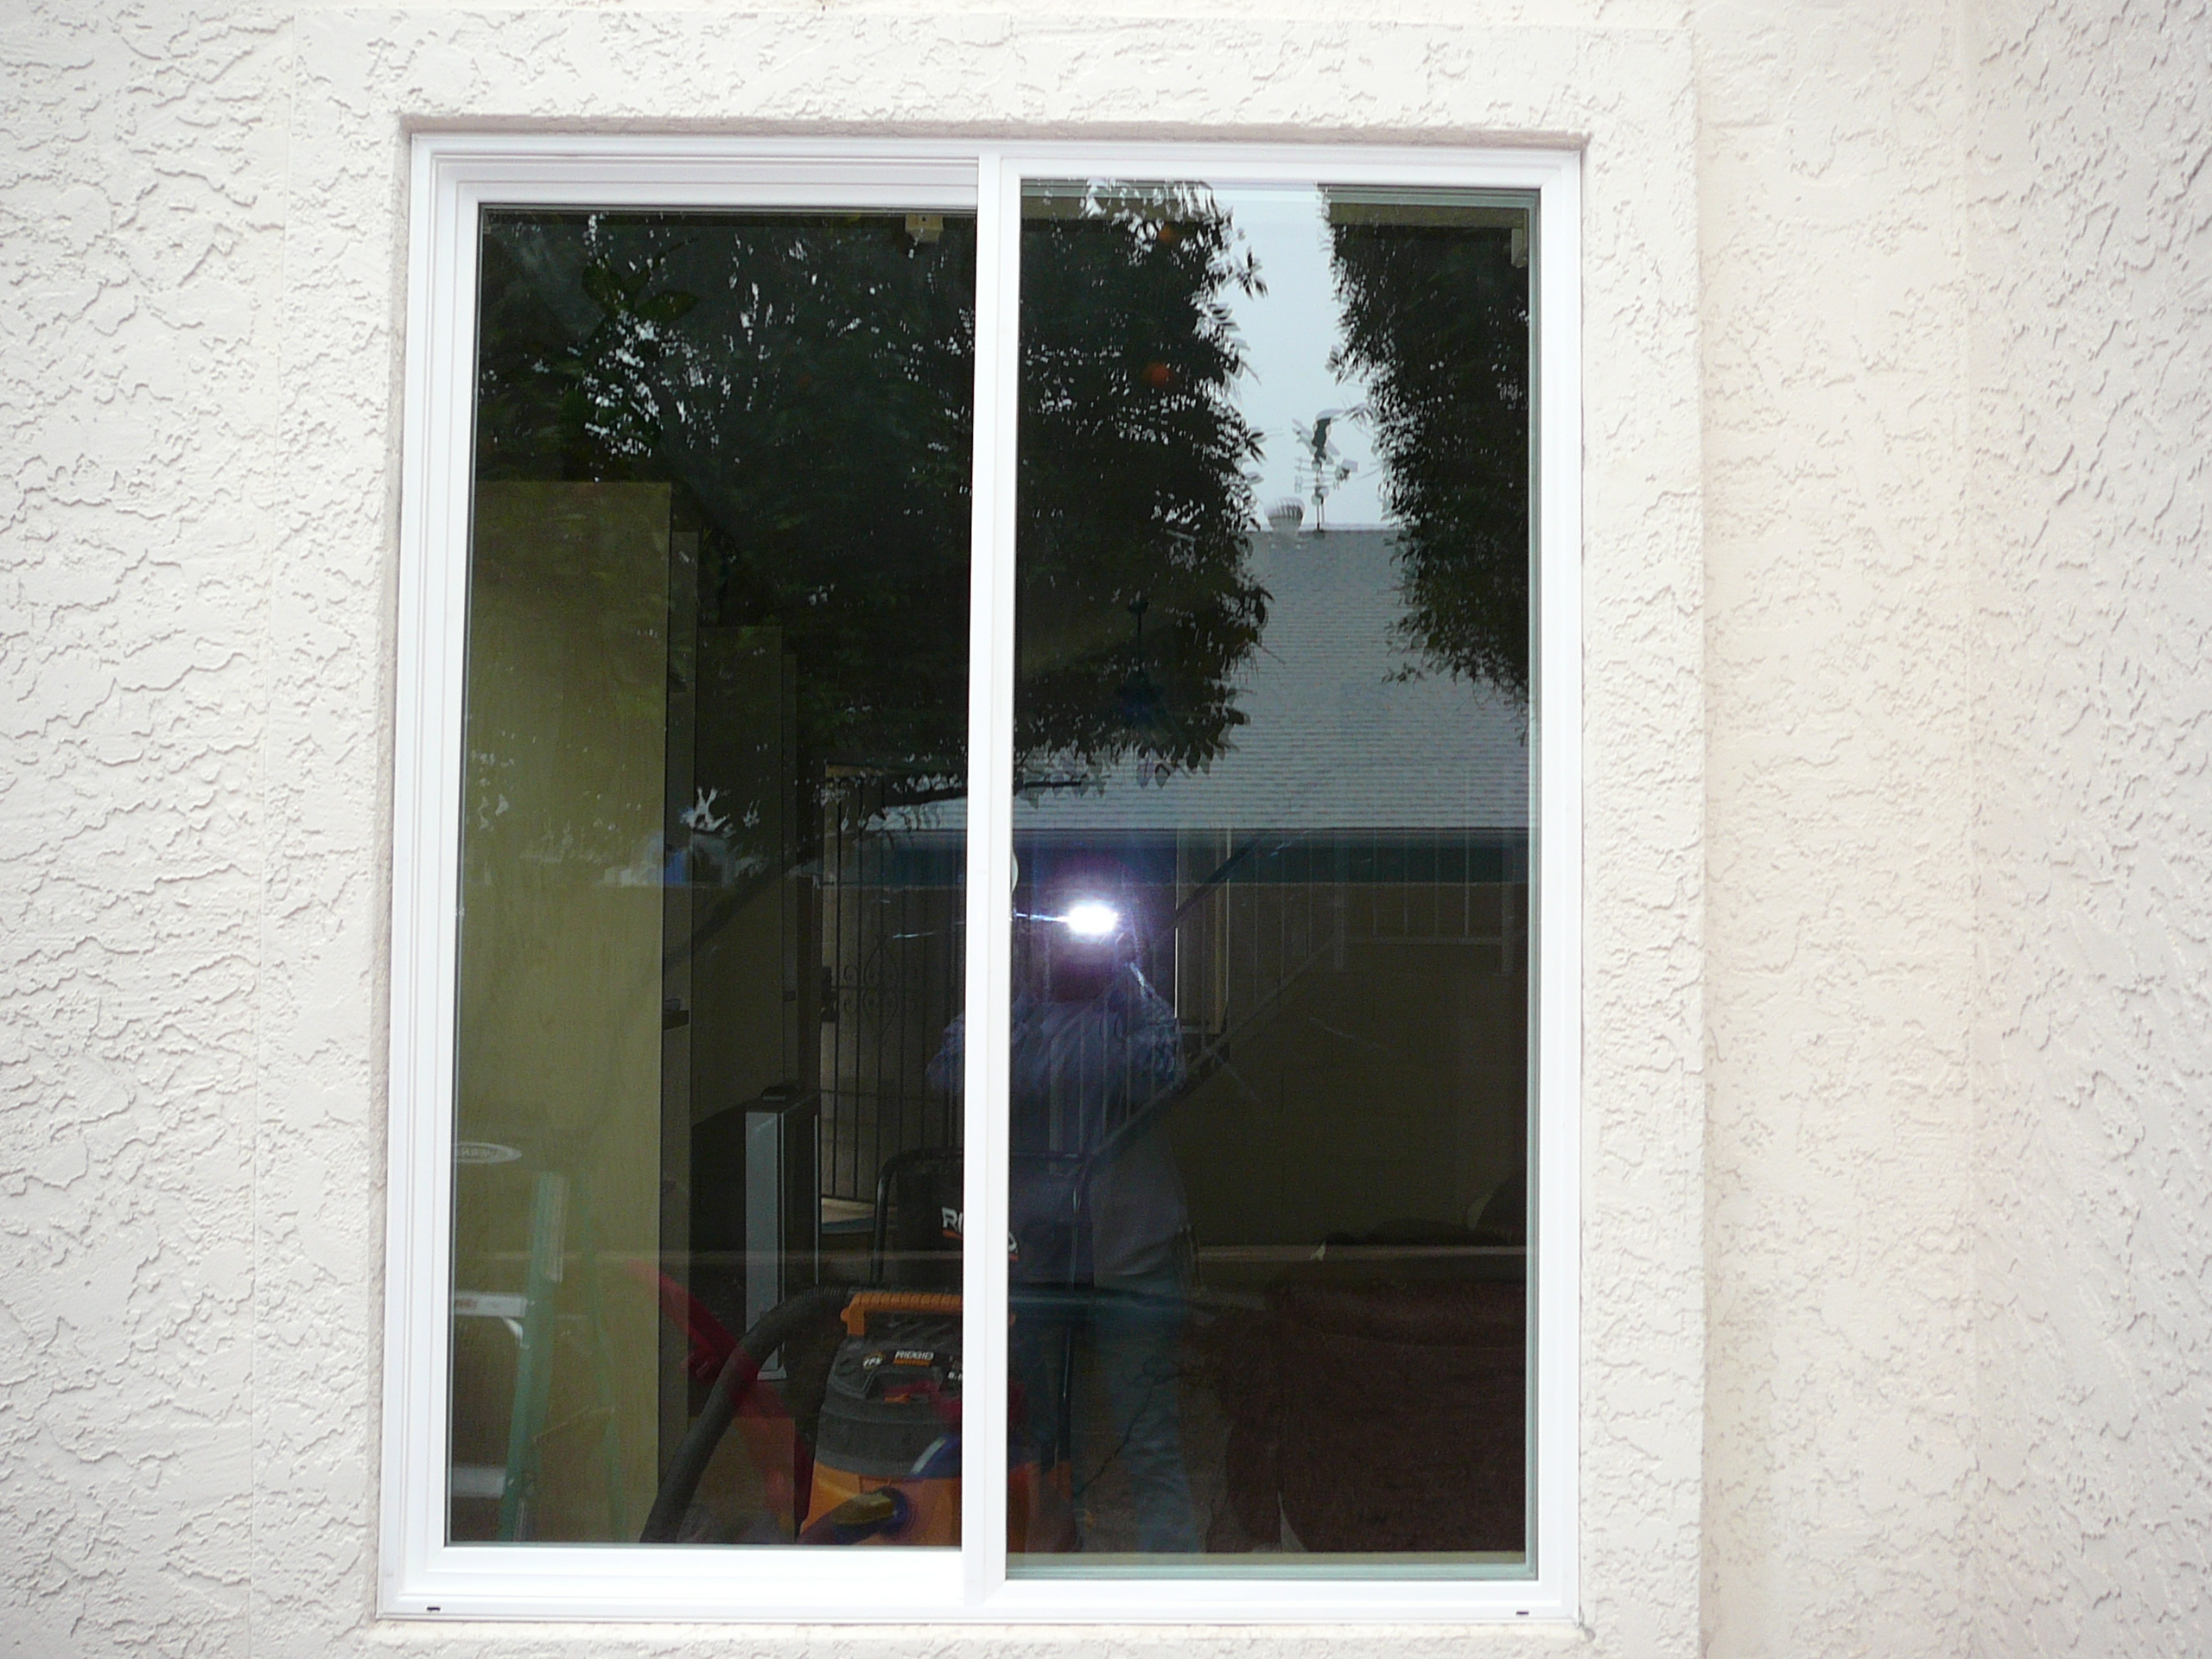 1920 #5F452C Arizona's Best Windows. Quality Replacement Windows & Doors picture/photo Best Quality Doors 39592560